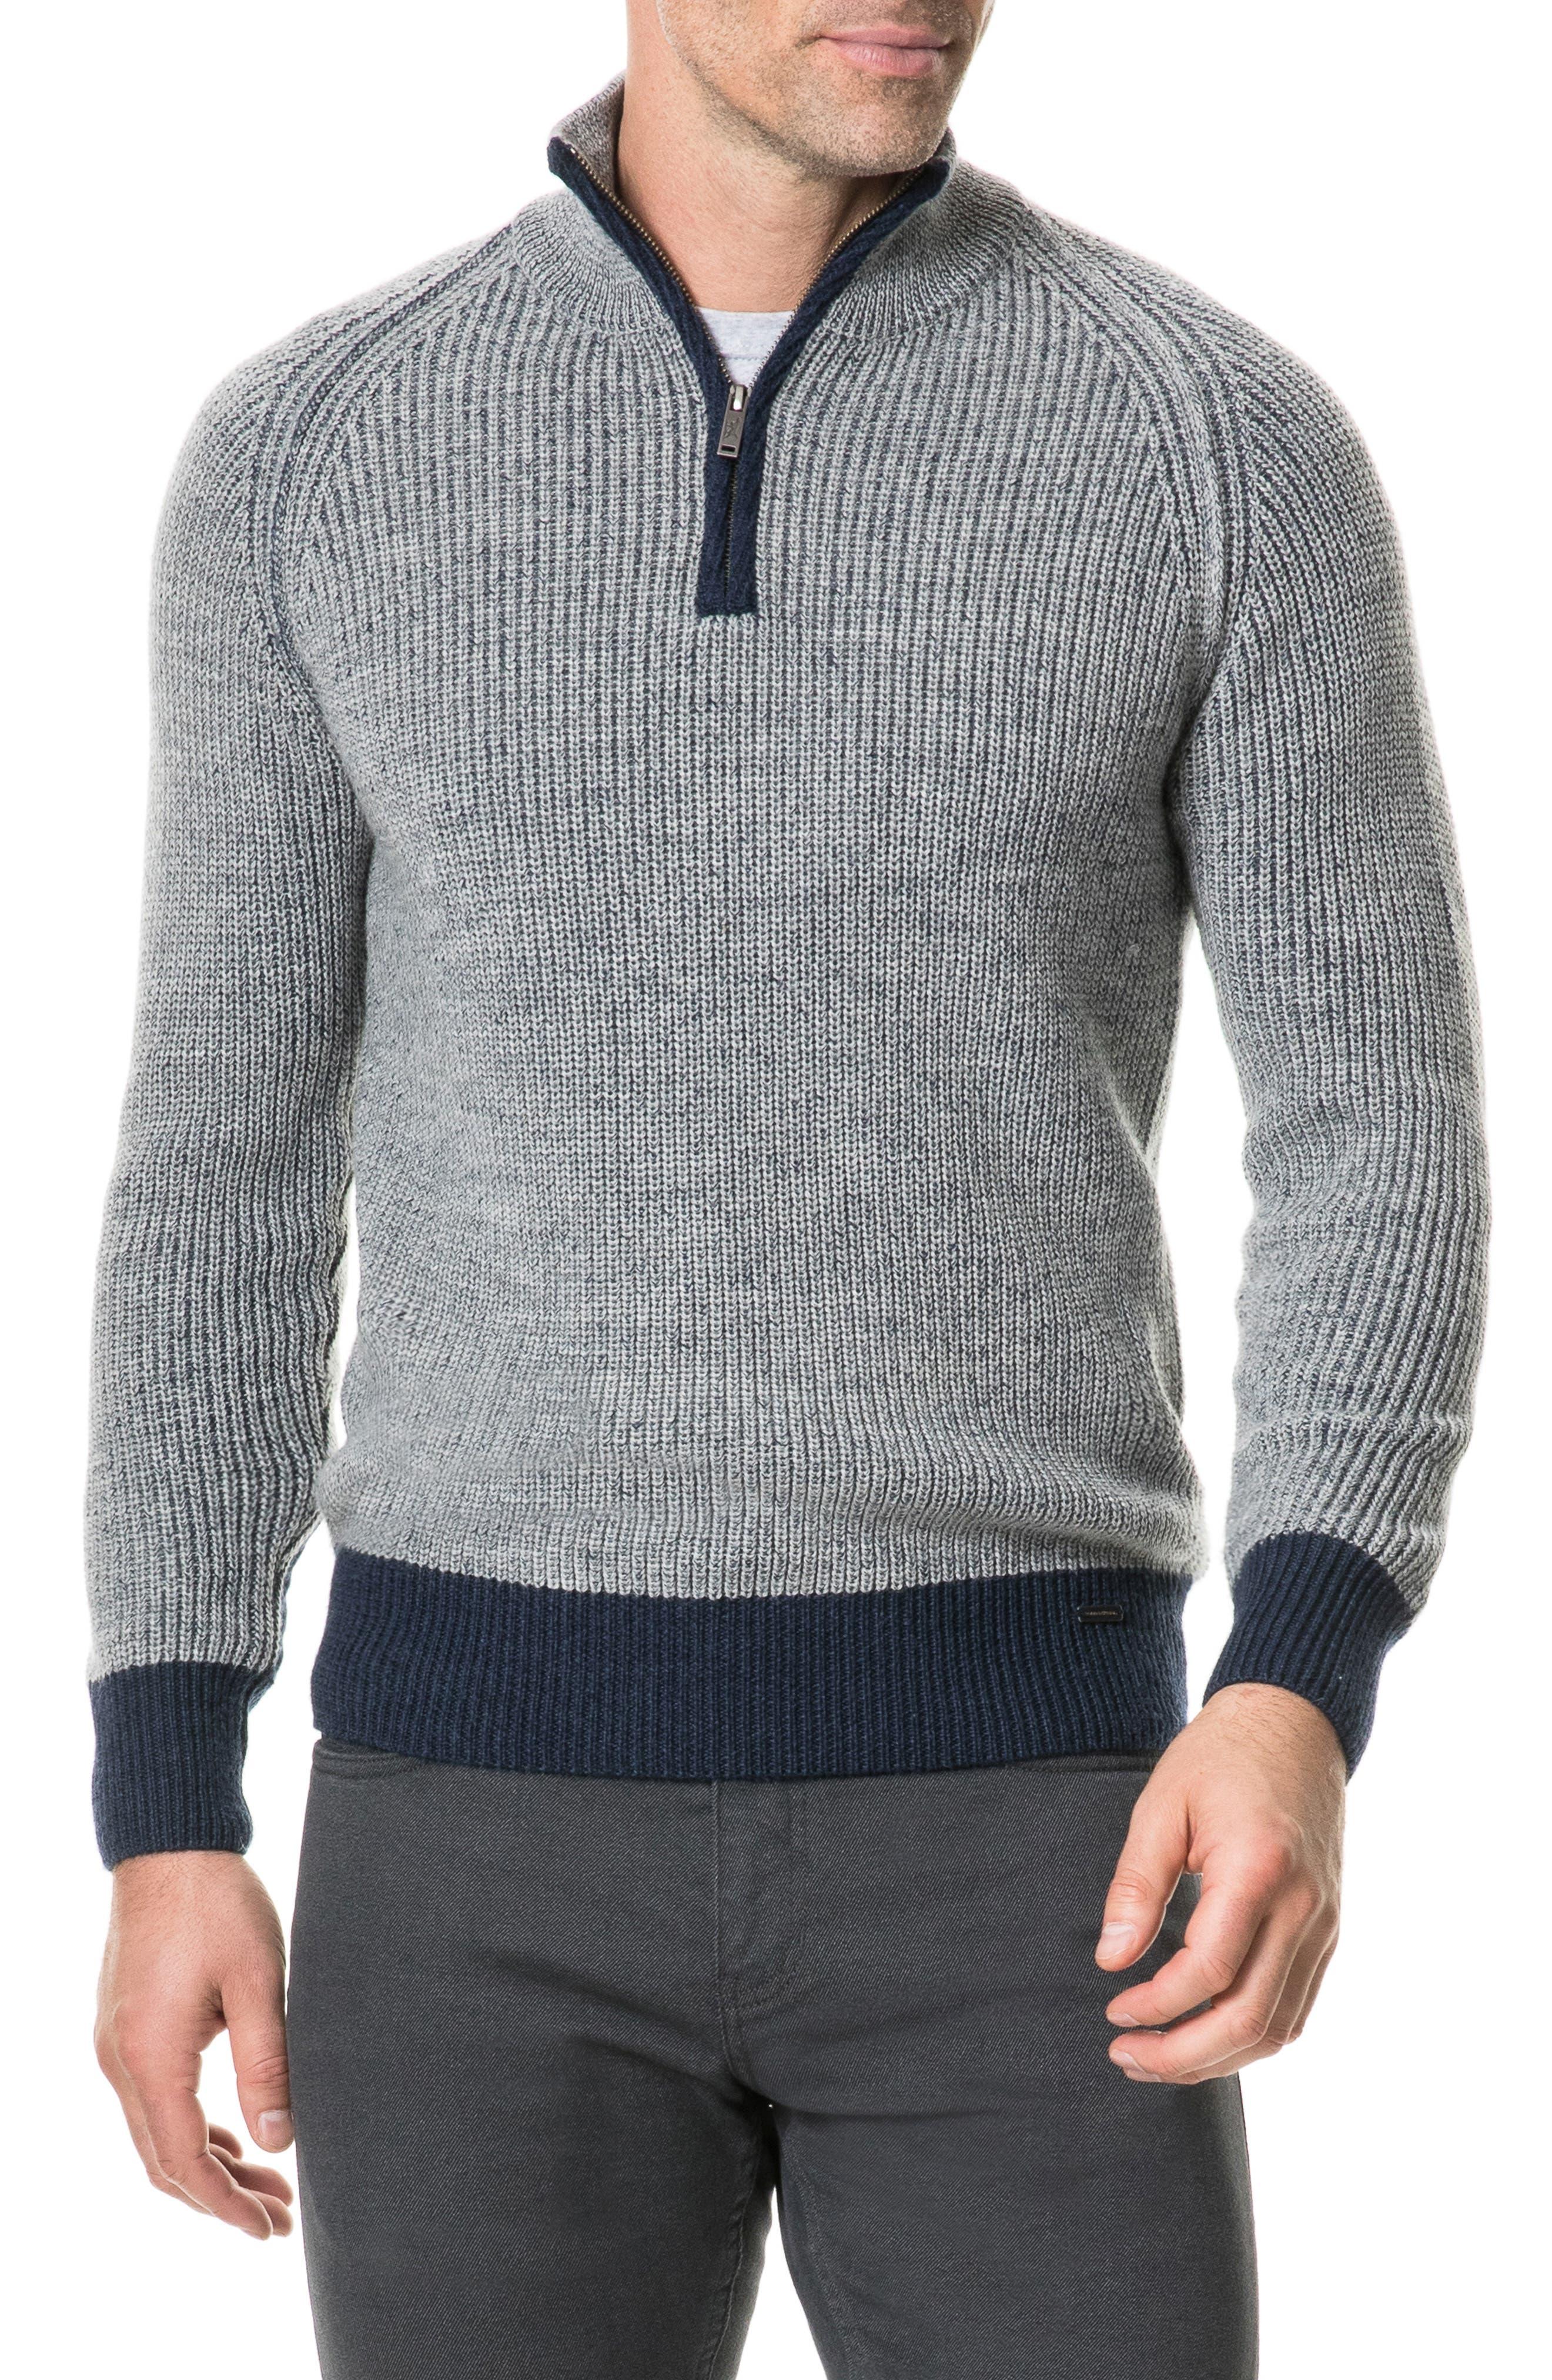 Mackinder Quarter Zip Merino Wool Sweater,                             Main thumbnail 1, color,                             268